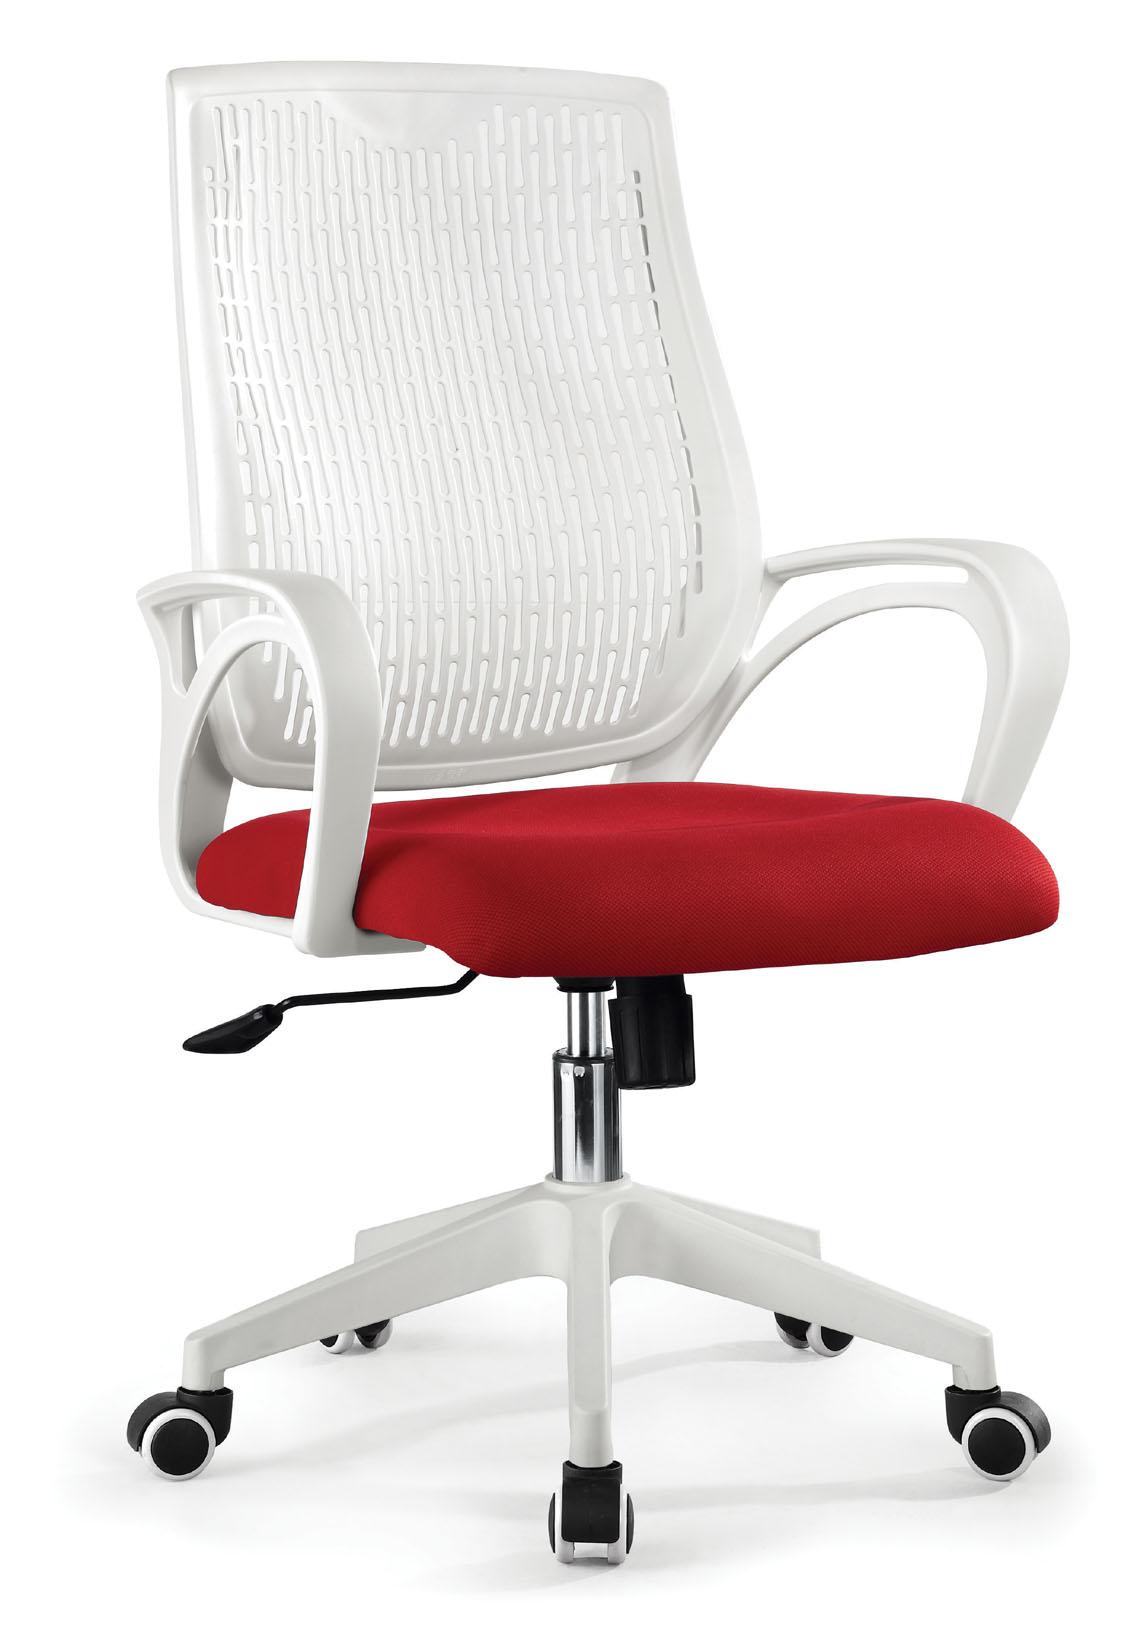 ZHSMC-03 Swivel Office Chair with White Armrest Mesh Backrest